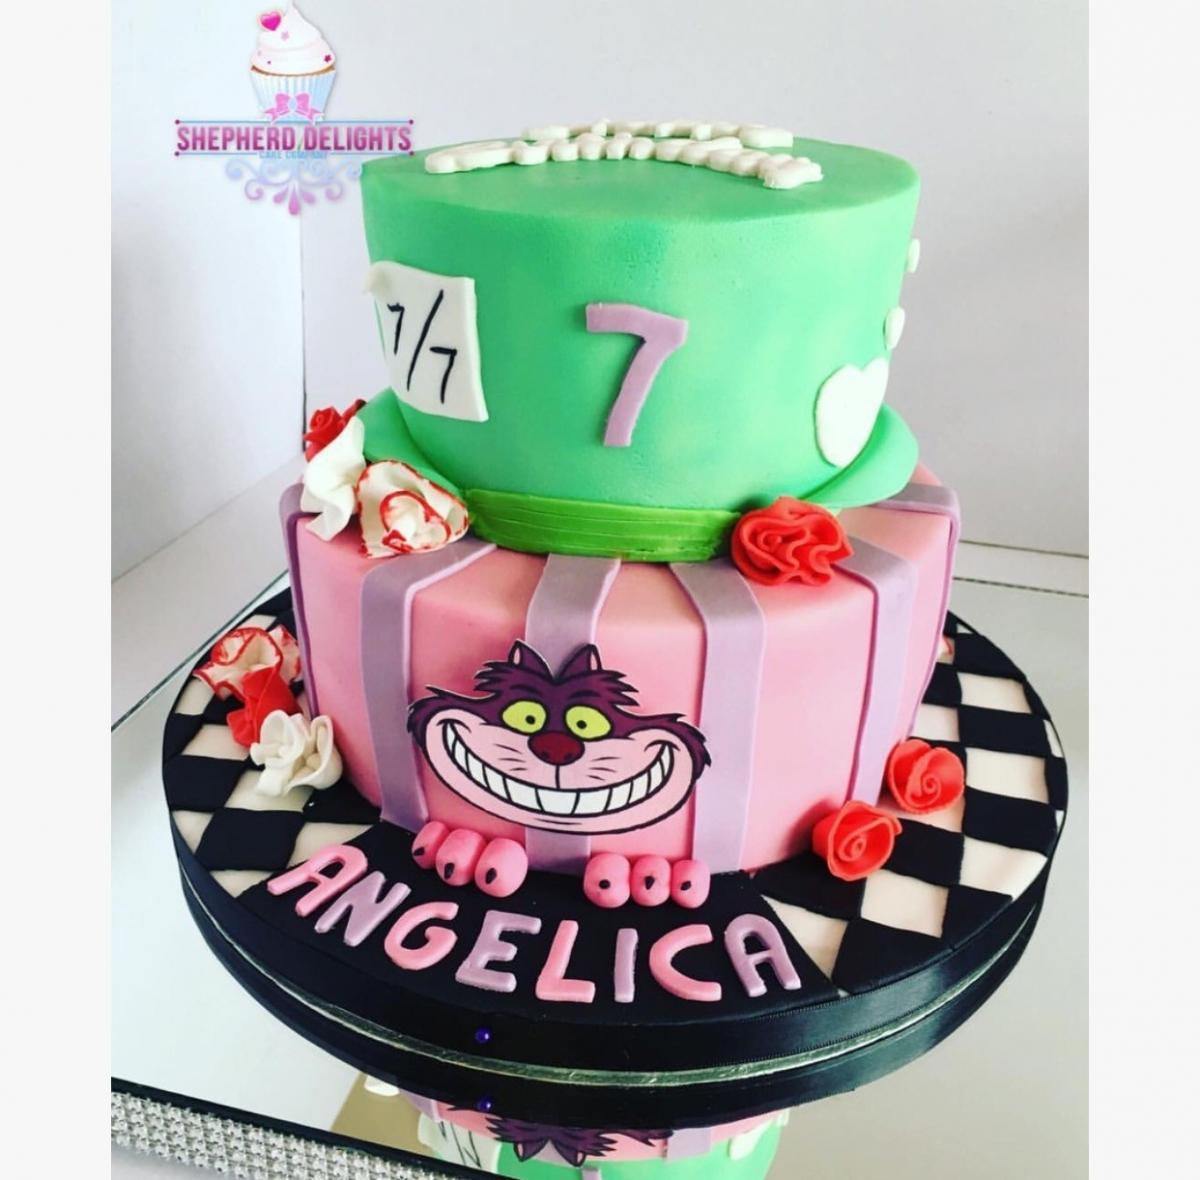 Surprising Alice In Wonderland Birthday Cake Birthday Cakes Cakes For Funny Birthday Cards Online Alyptdamsfinfo